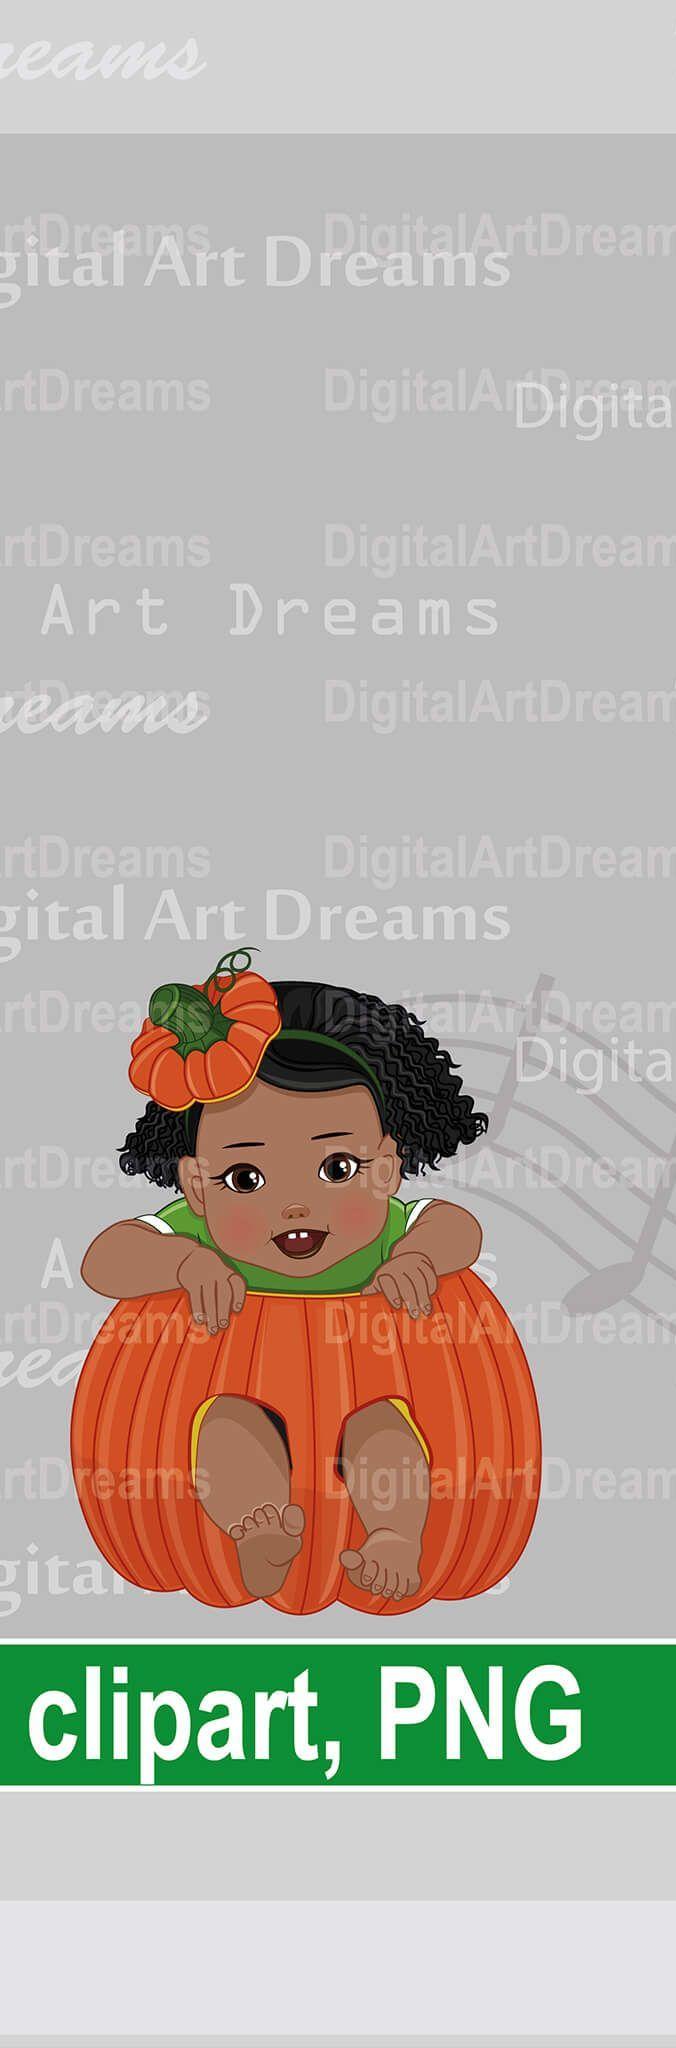 Baby Pumpkin Clipart : pumpkin, clipart, Pumpkin, Clipart, Little, Image, Clipart,, Artwork,